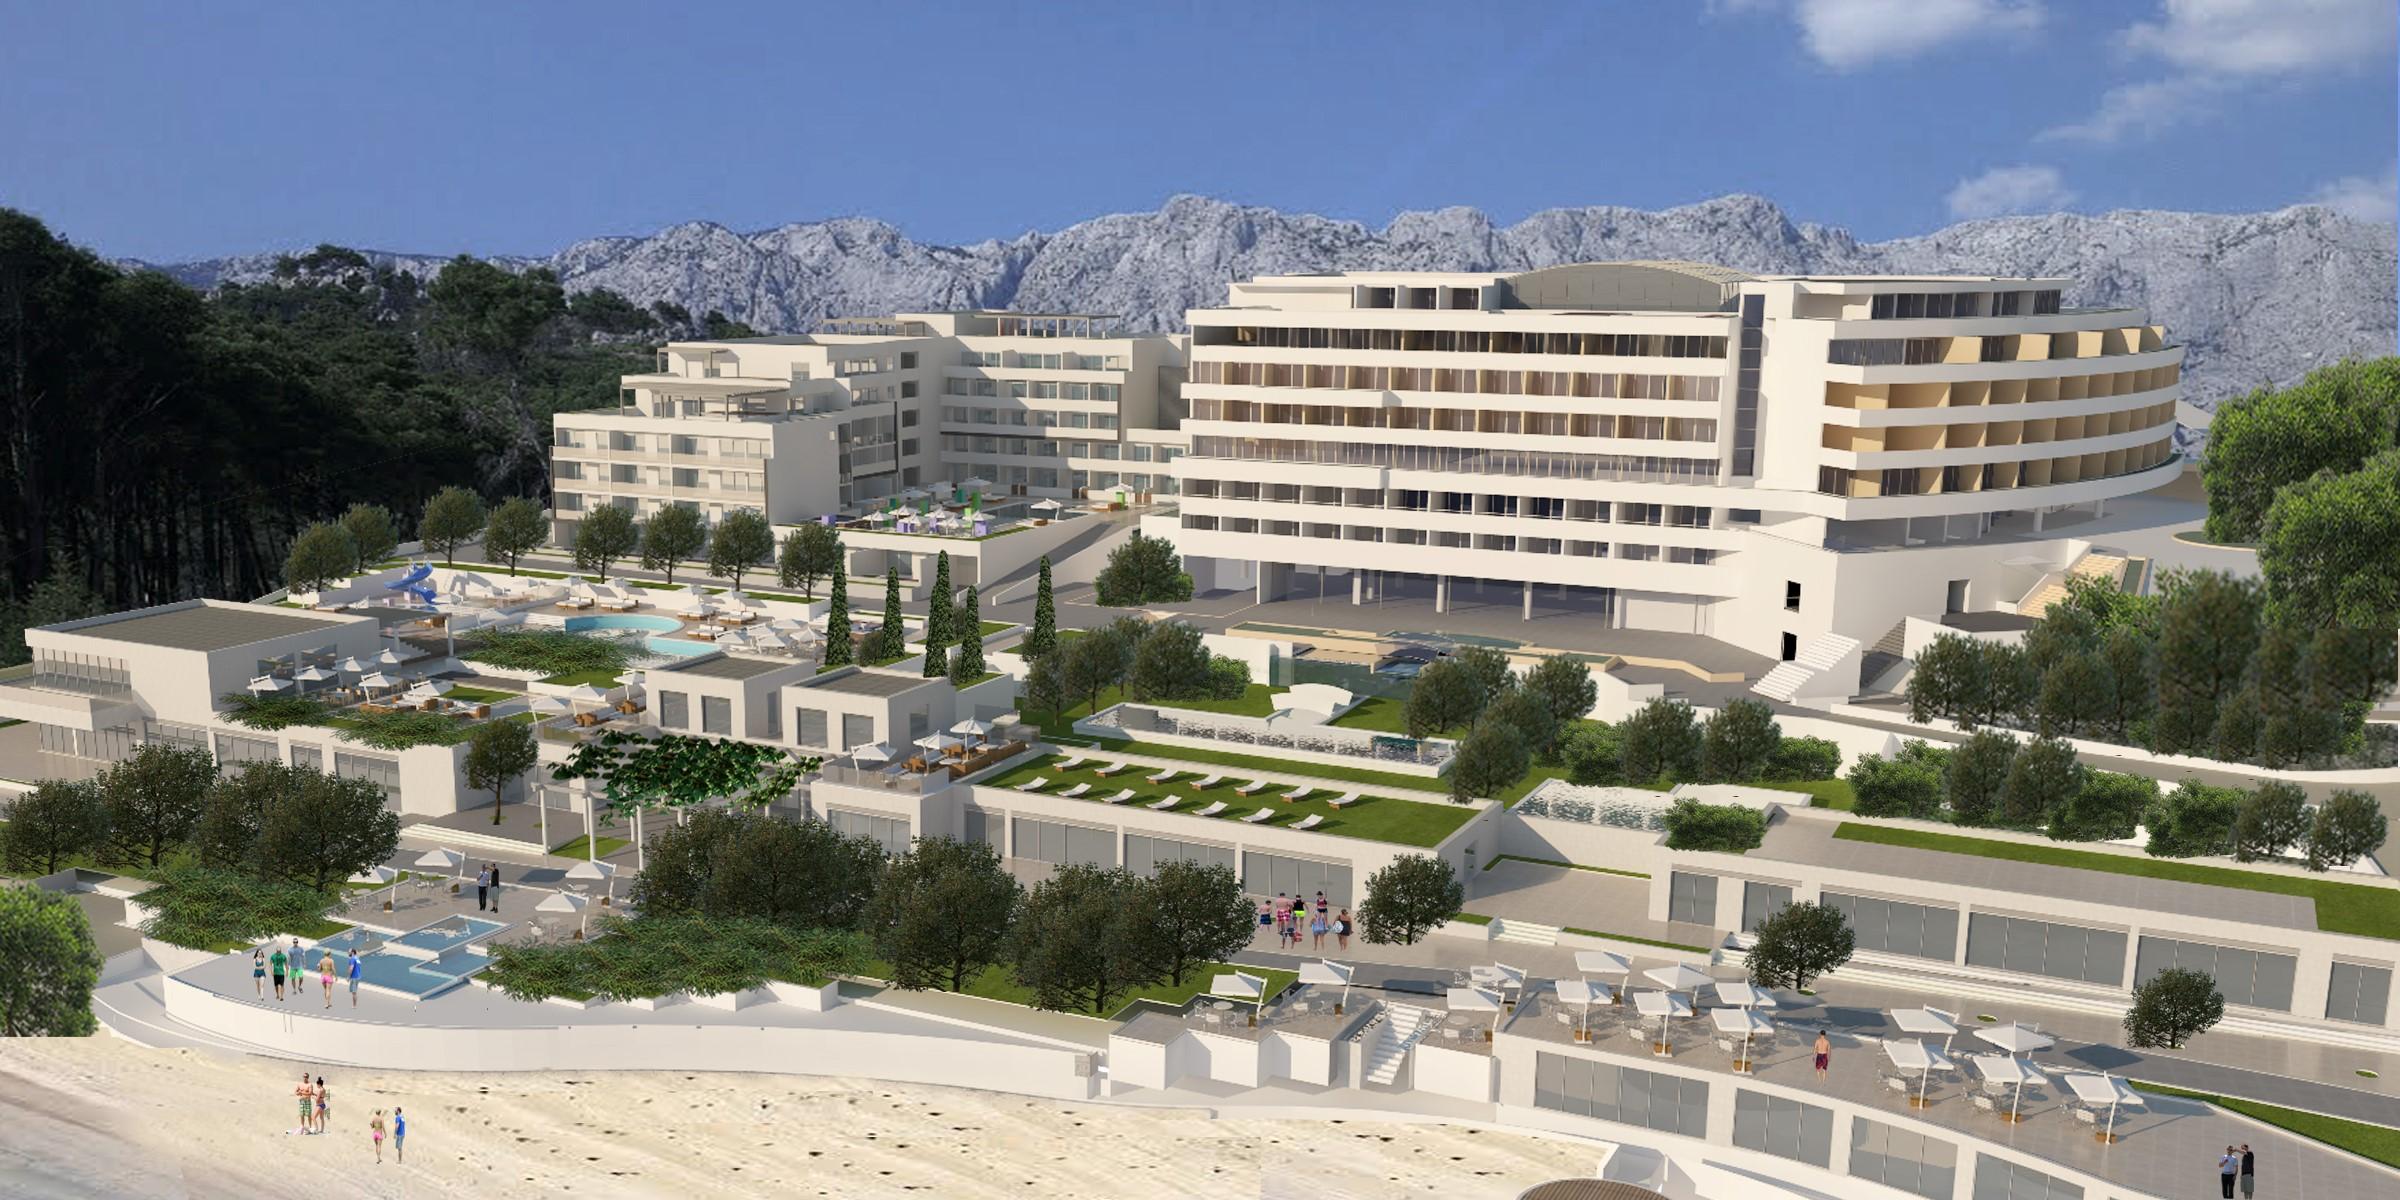 Photos New 50 Million Hotel To Open On Dalmatian Coast